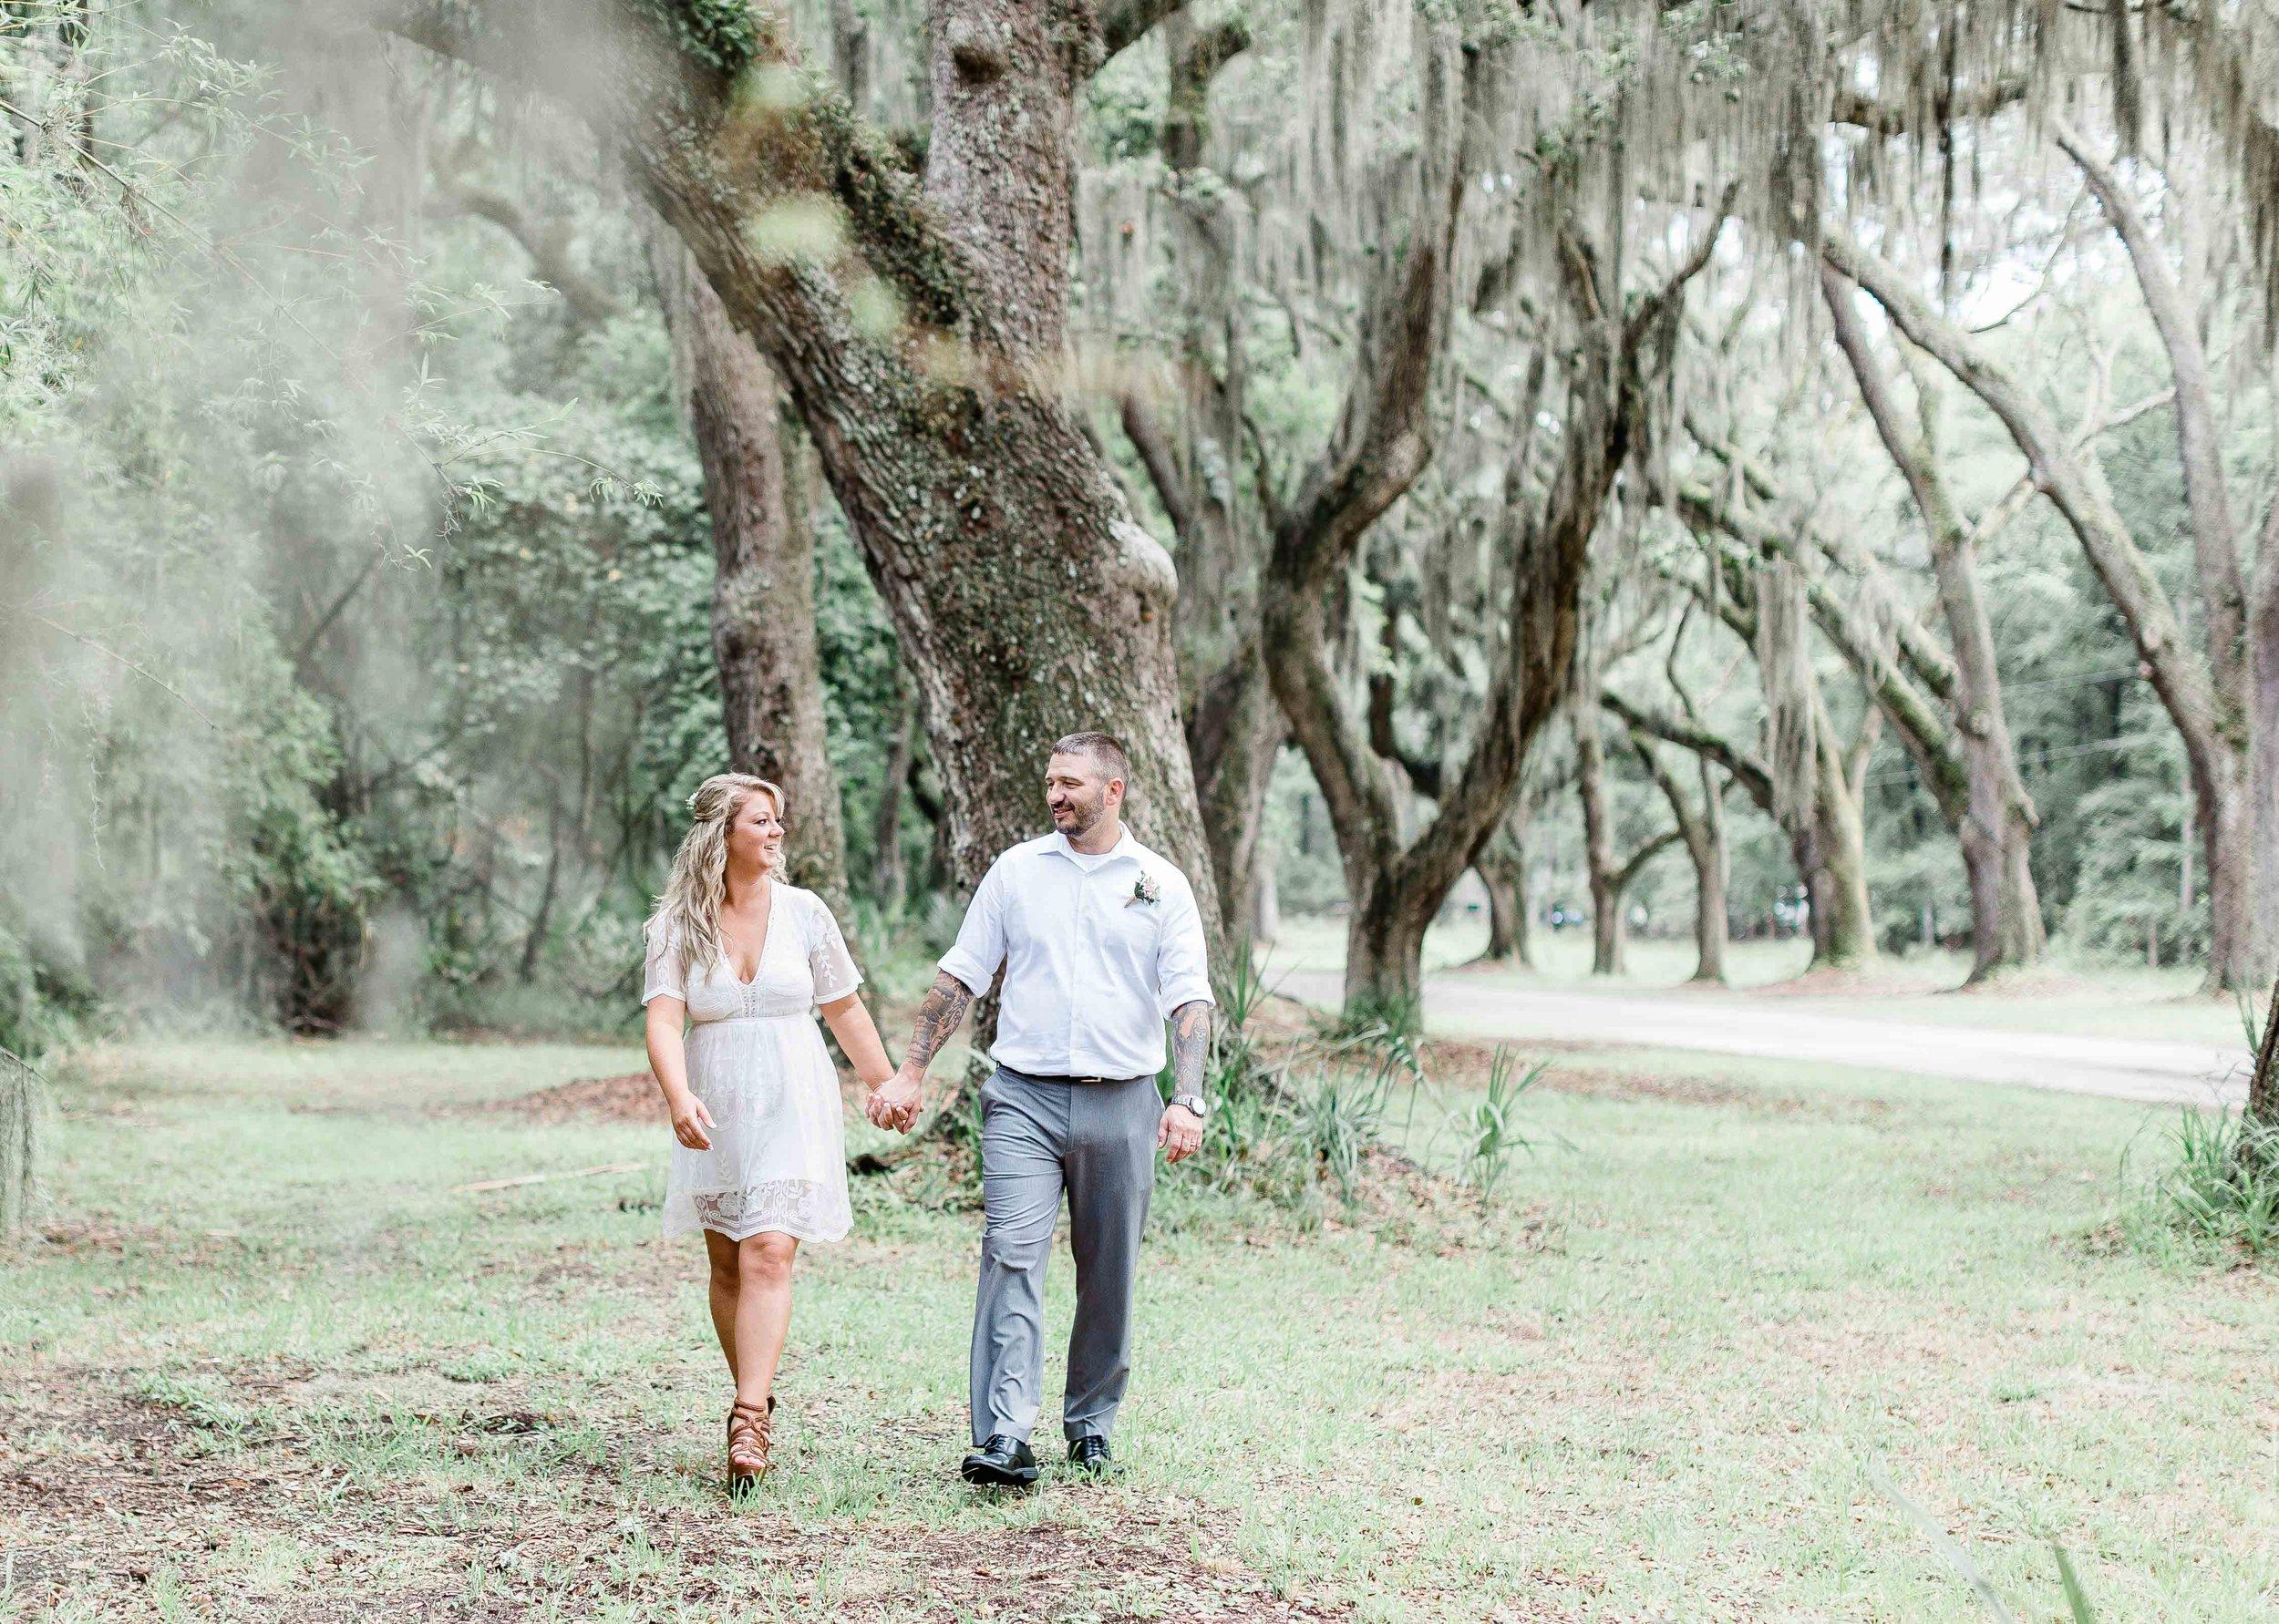 20190727Georgia-Wormlsoe Plantation-Simply Eloped-Savannah Wedding Photographer- Southern Lens Photography39.jpg